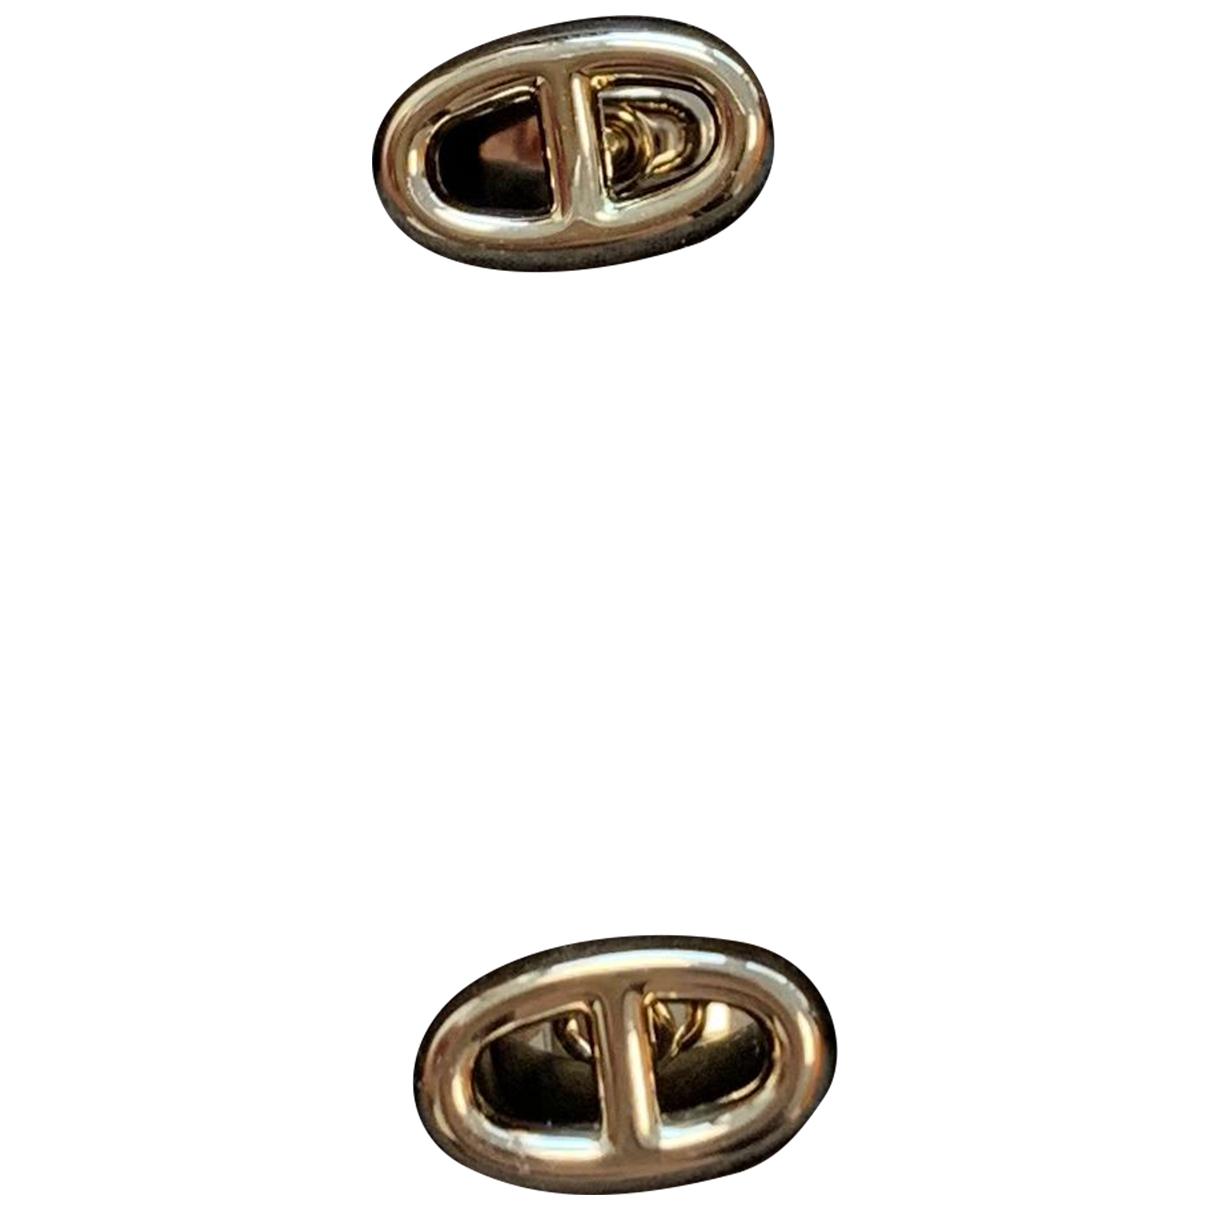 Hermès Chaîne d'Ancre Pink gold Earrings for Women N